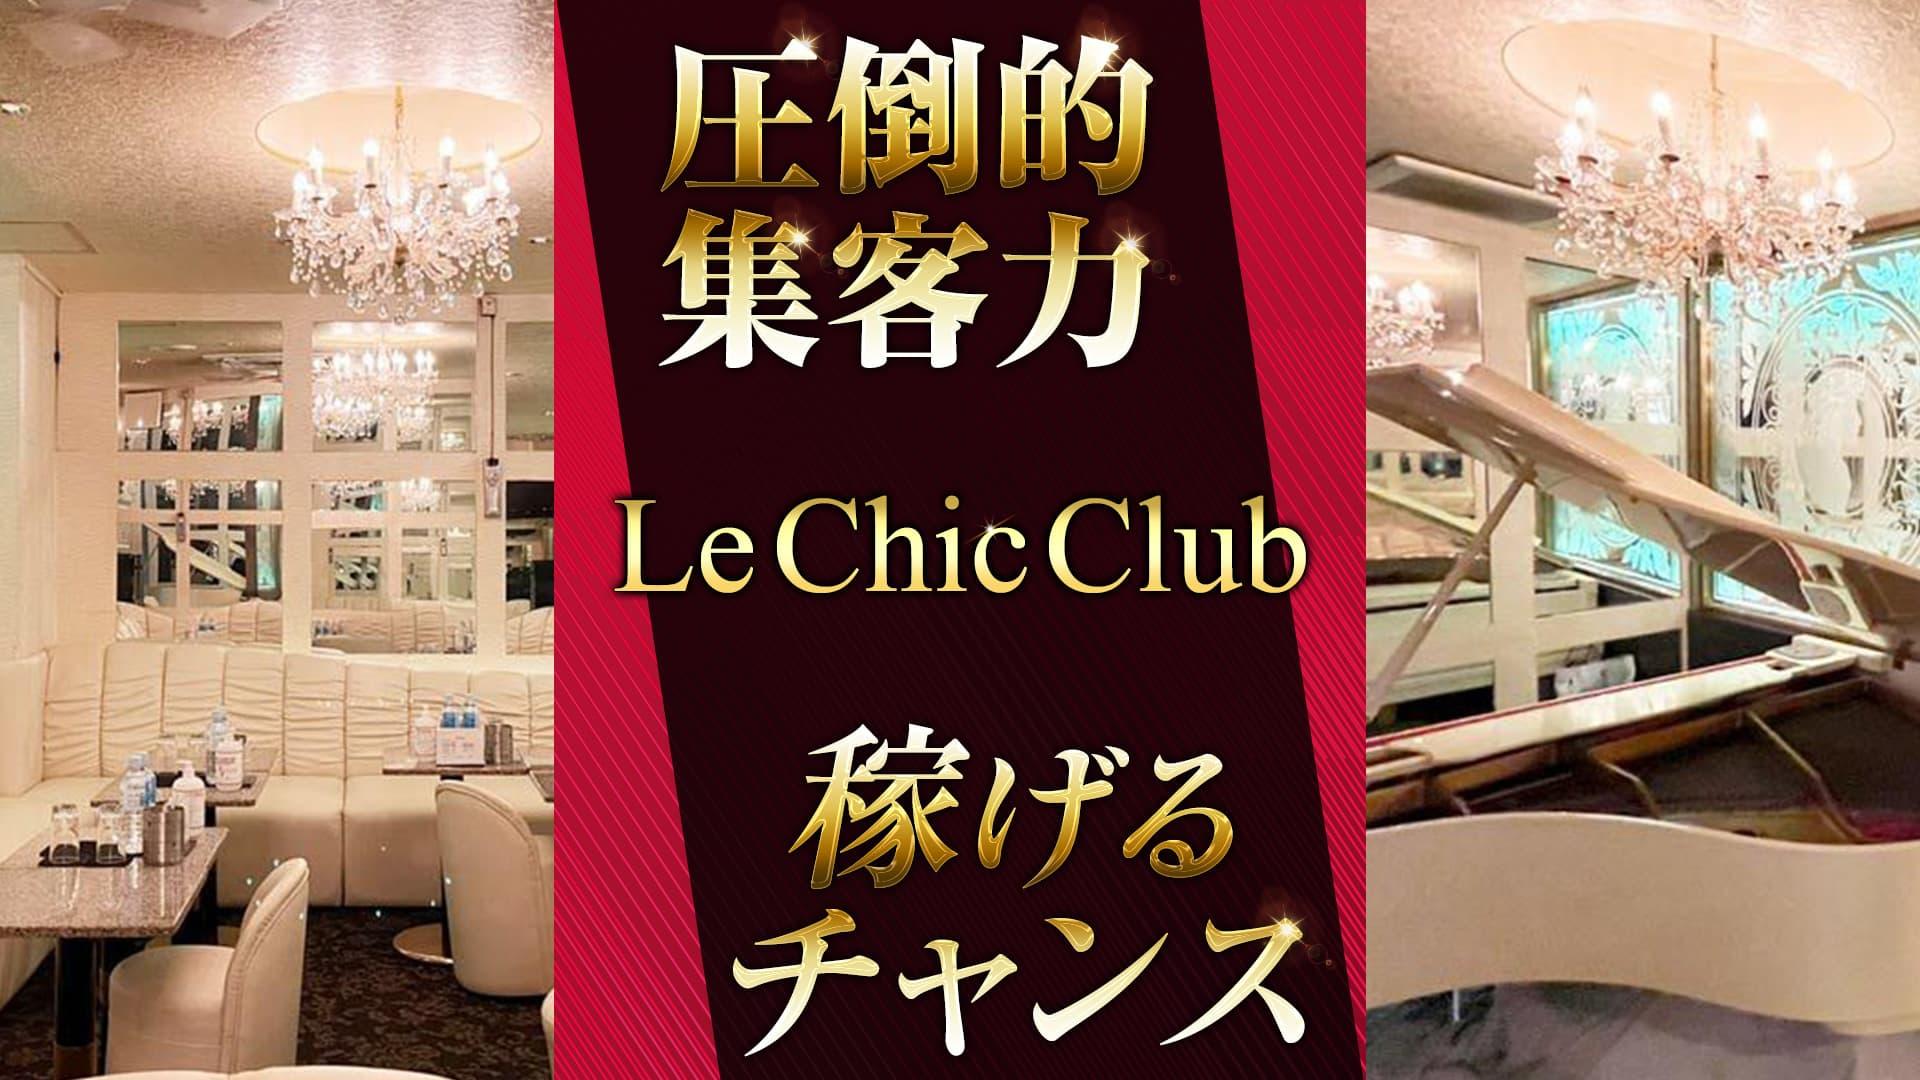 Le Chic Club(ラシック)【公式求人・体入情報】 川崎キャバクラ TOP画像